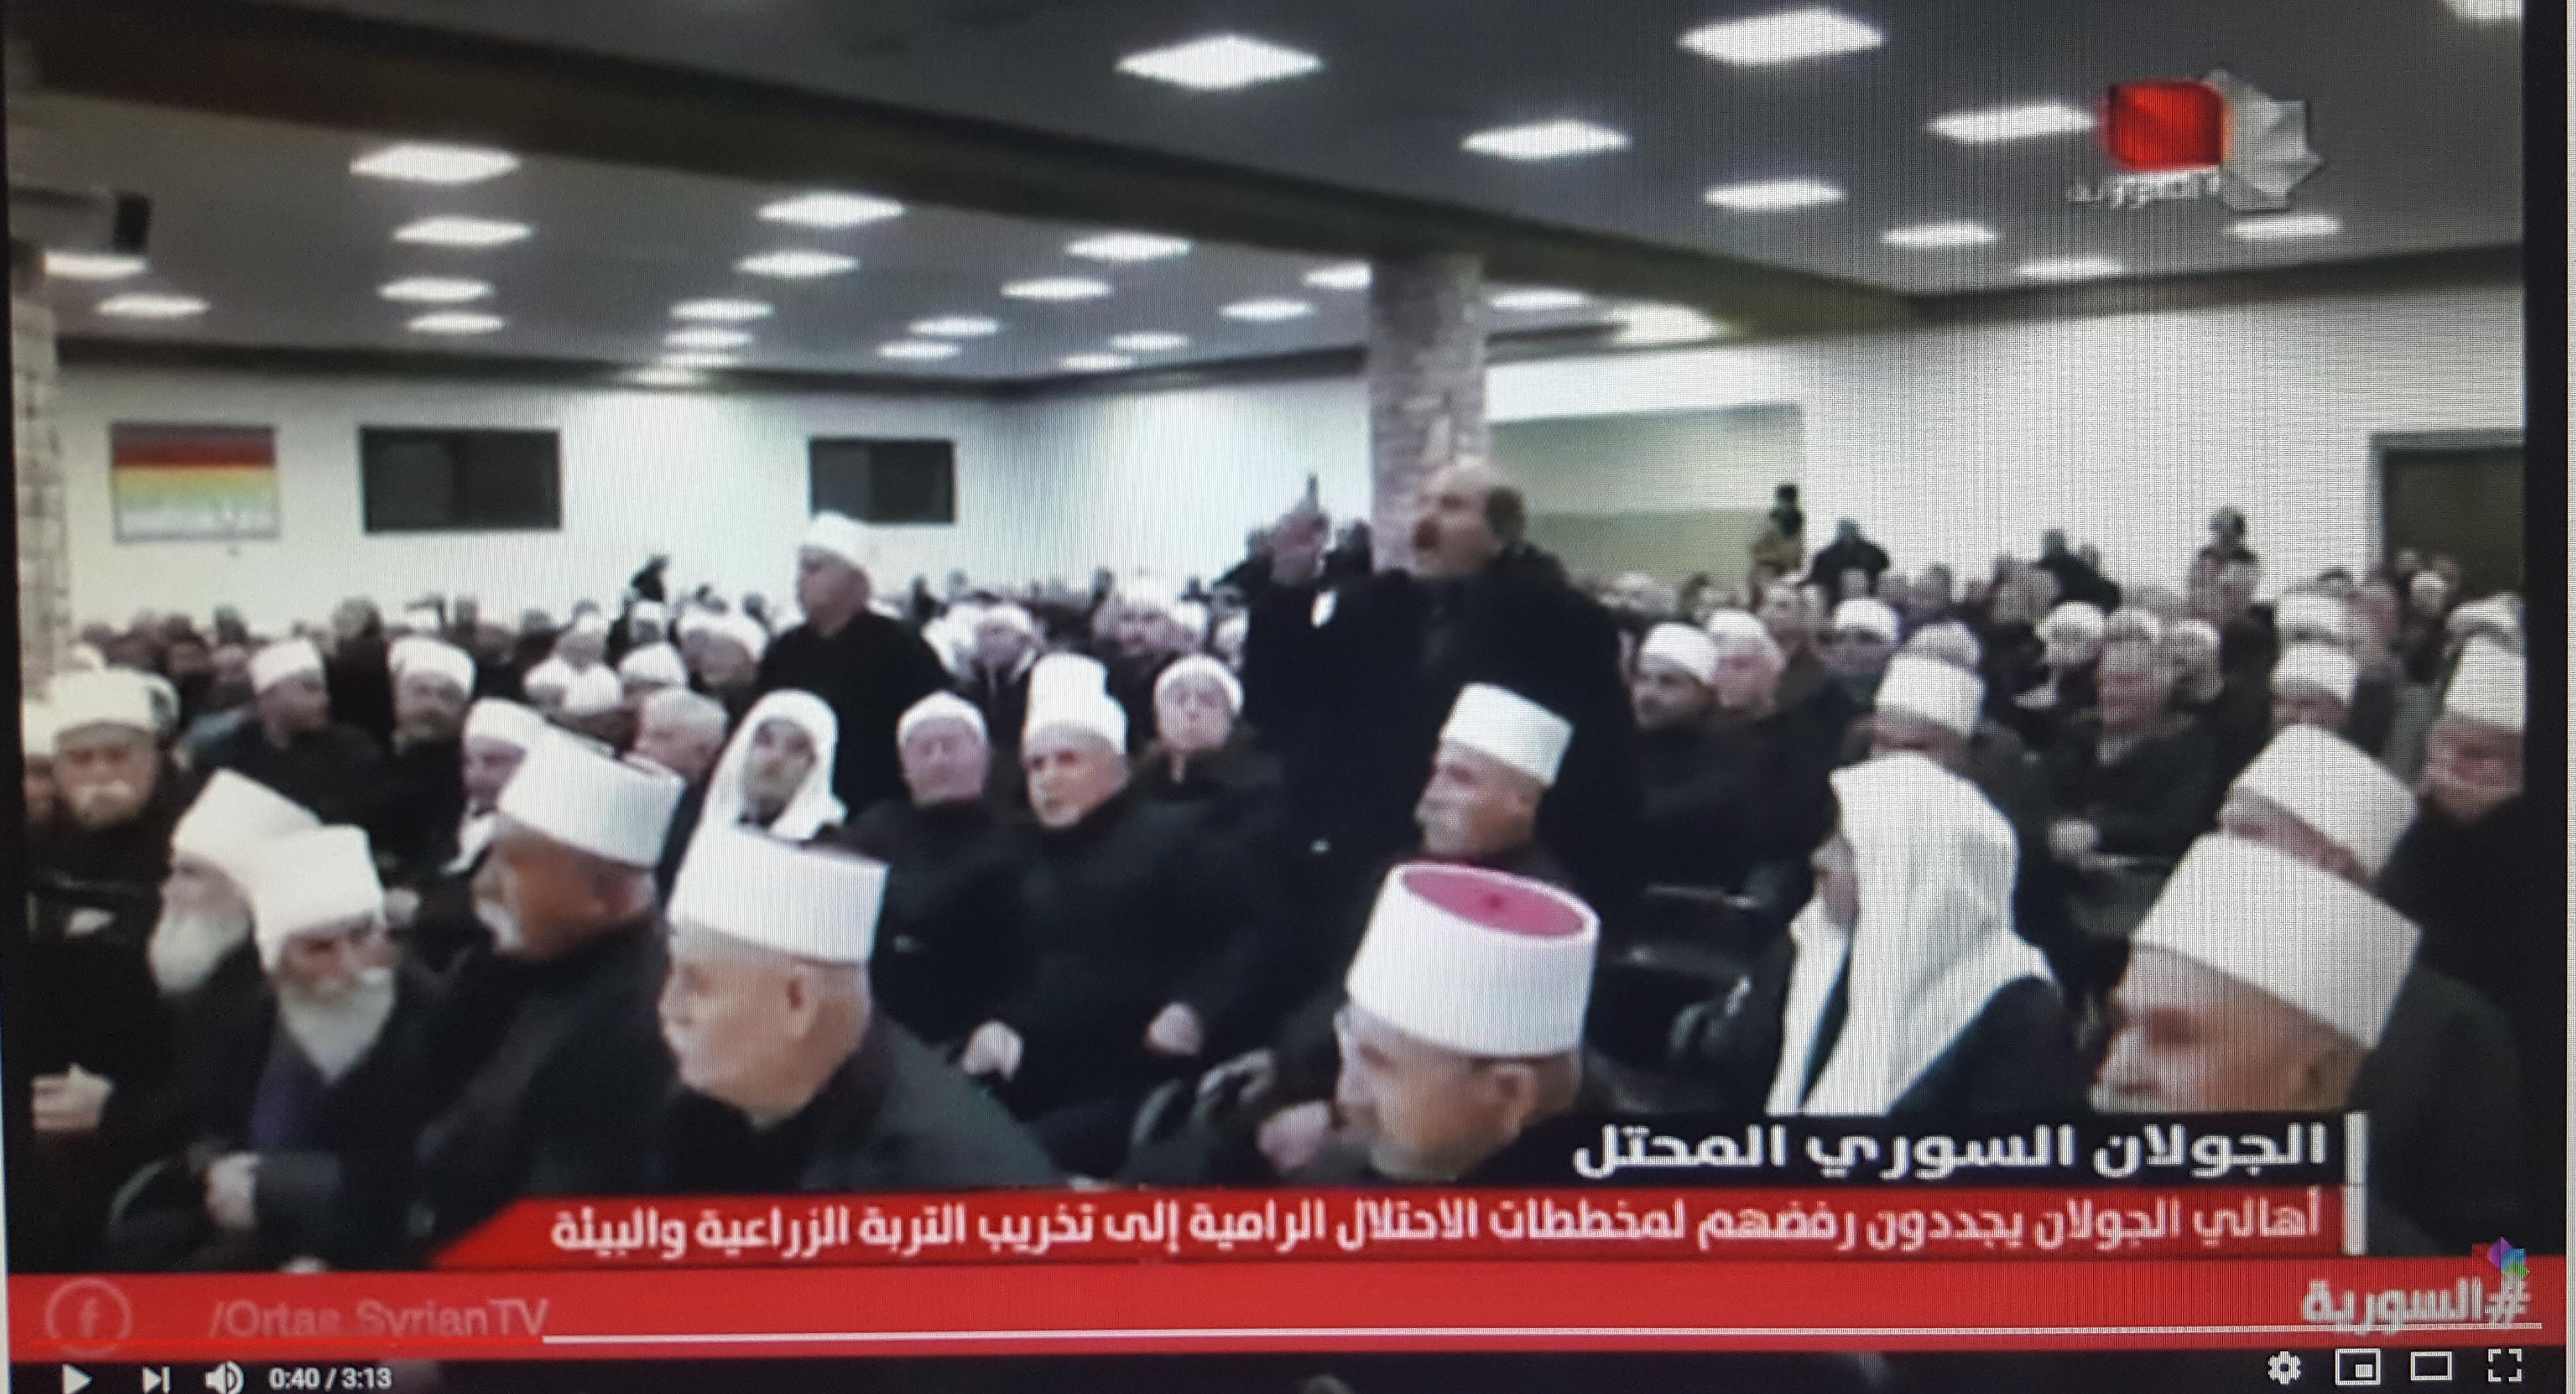 Photo of تغطية السورية لاجتماع مسعدة الرافض لاقامة المراوح في الجولان